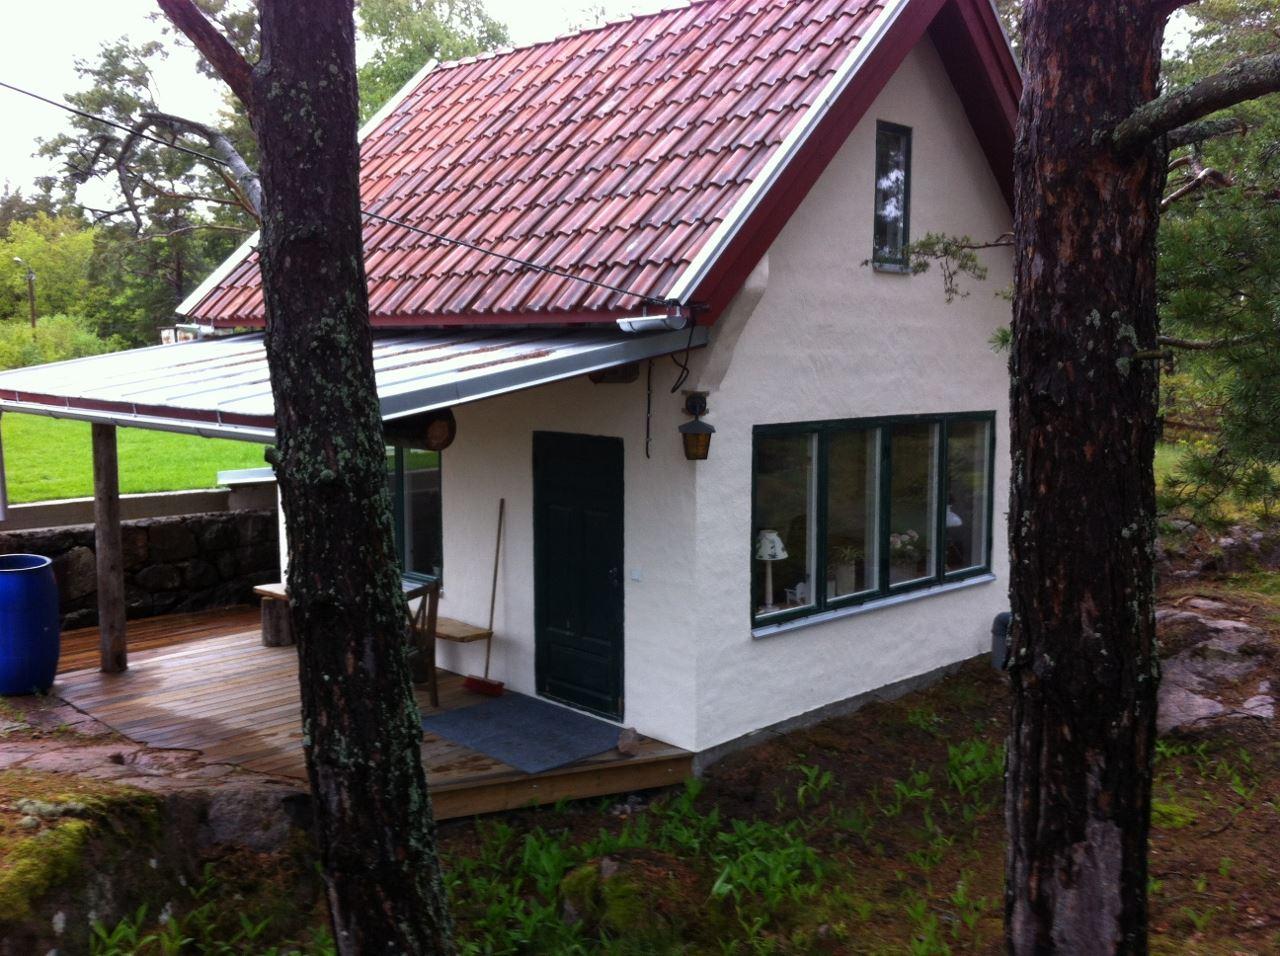 Idyllic summer spot north of Oskarshamn